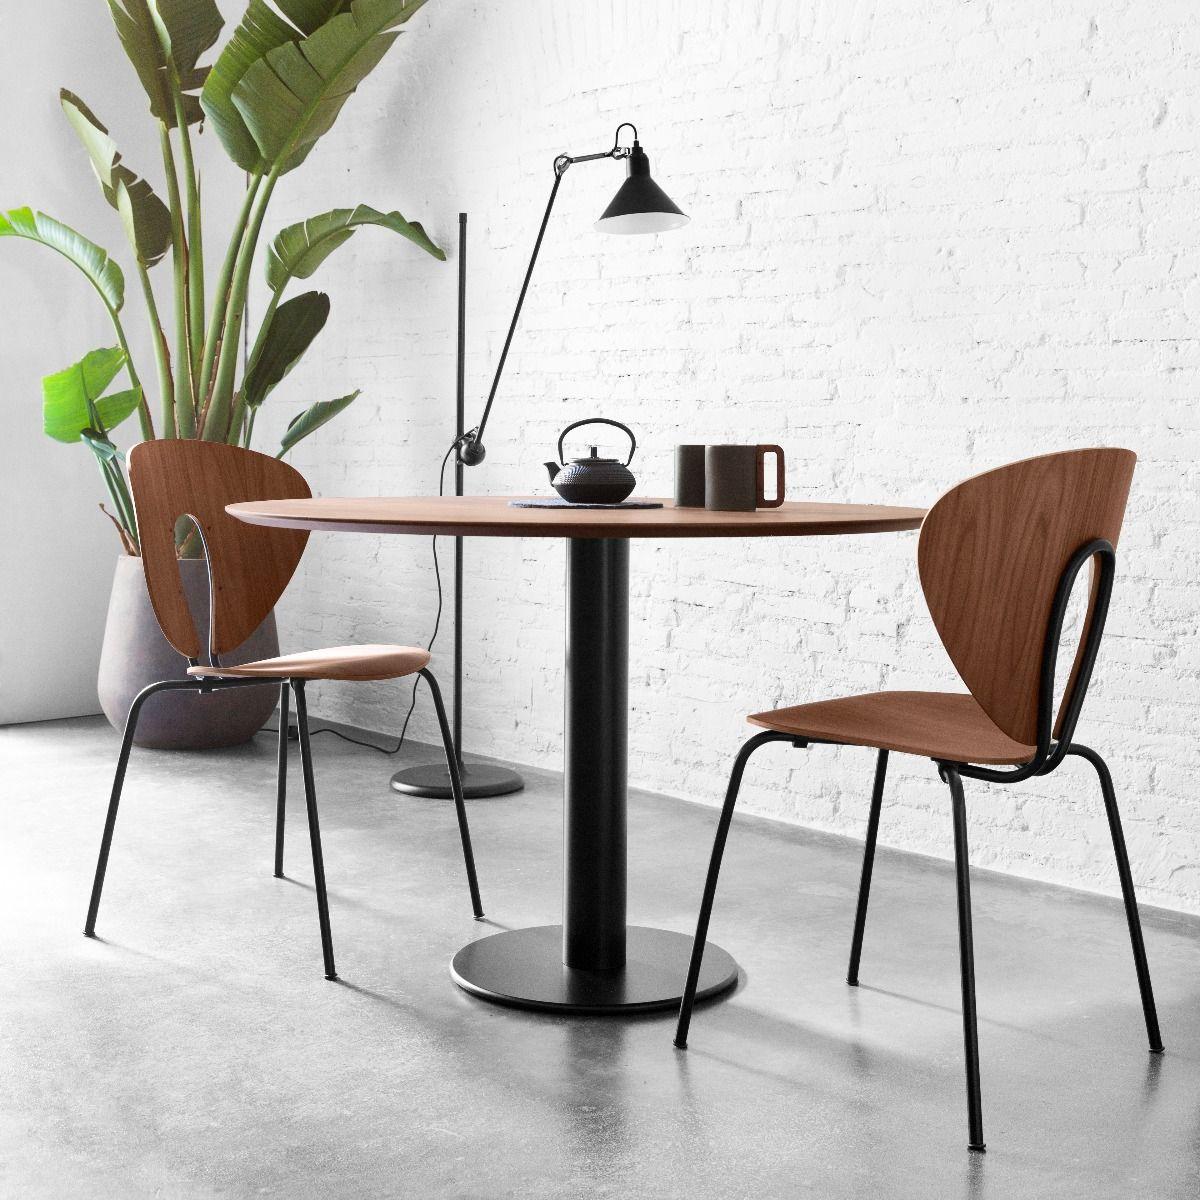 STUA Globus wood chair in walnut around a zero table